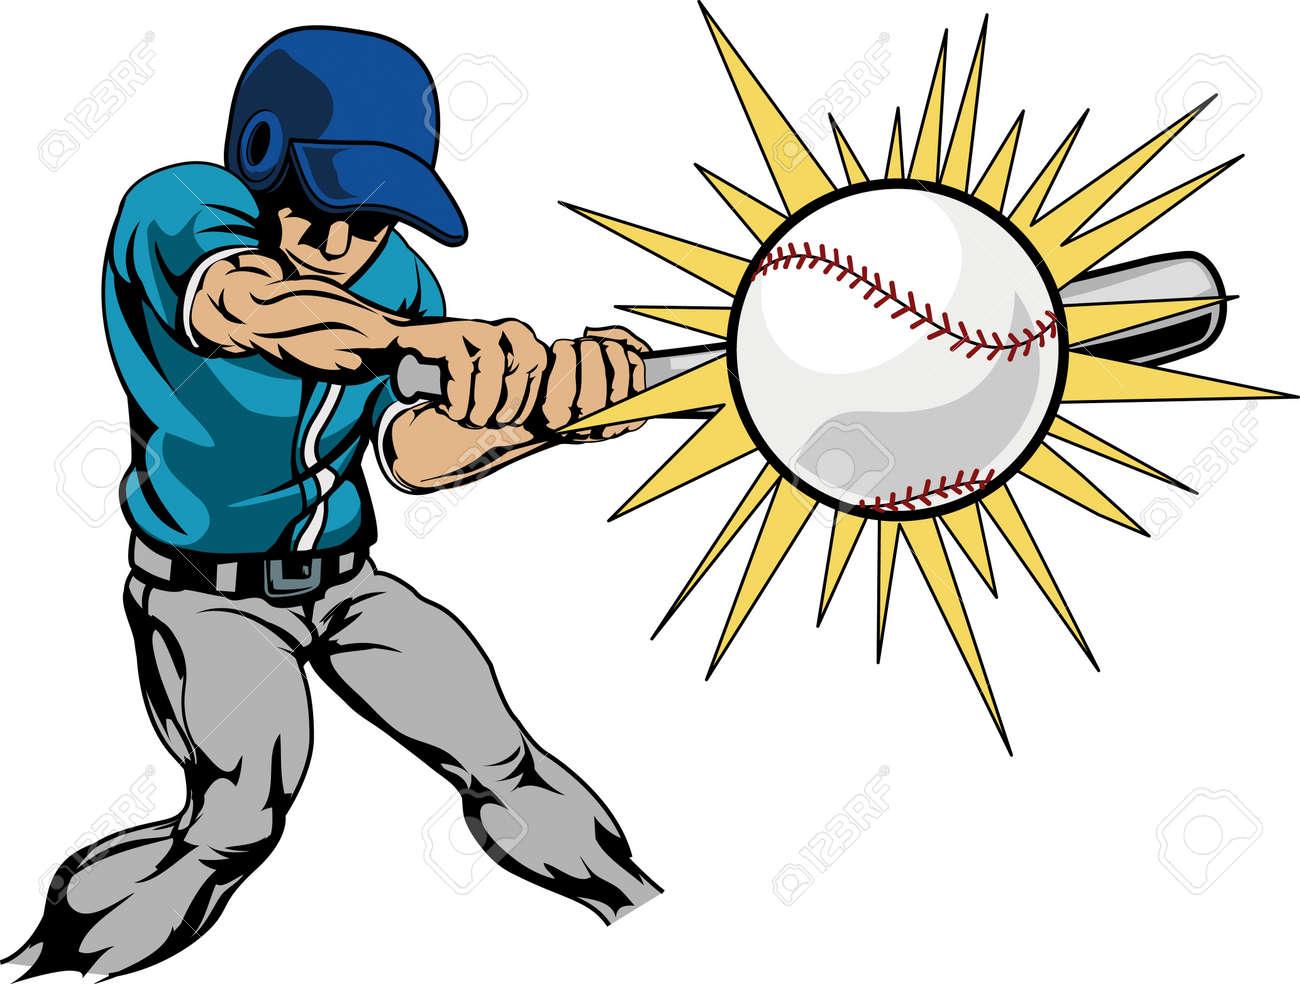 Illustration of baseball player swinging bat to hit baseball - 4113464